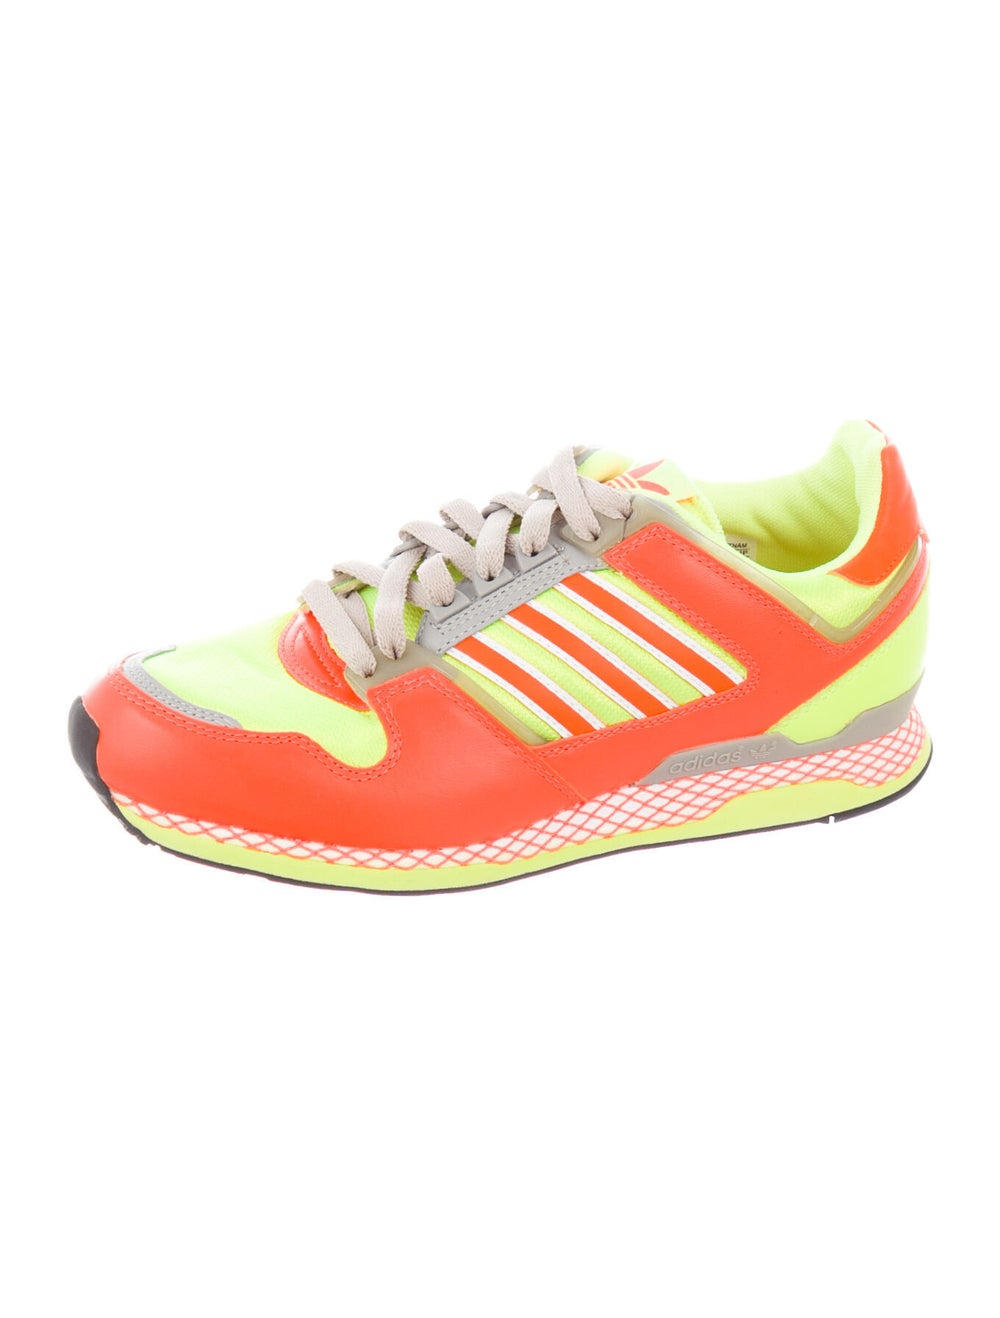 Adidas Leather Printed Athletic Sneakers Orange - image 2